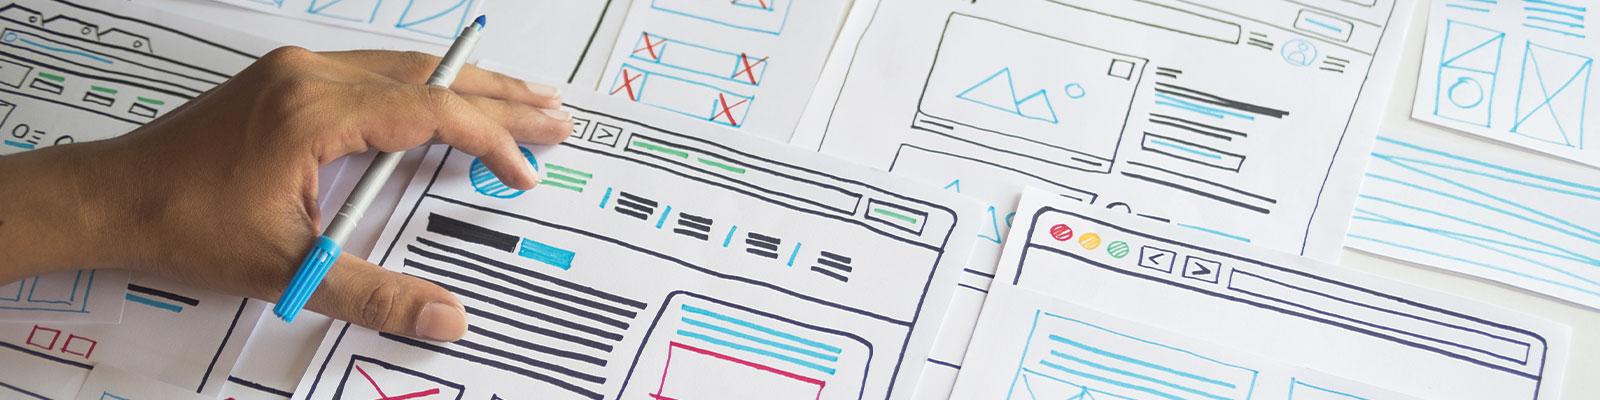 Webdesign & ergonomie